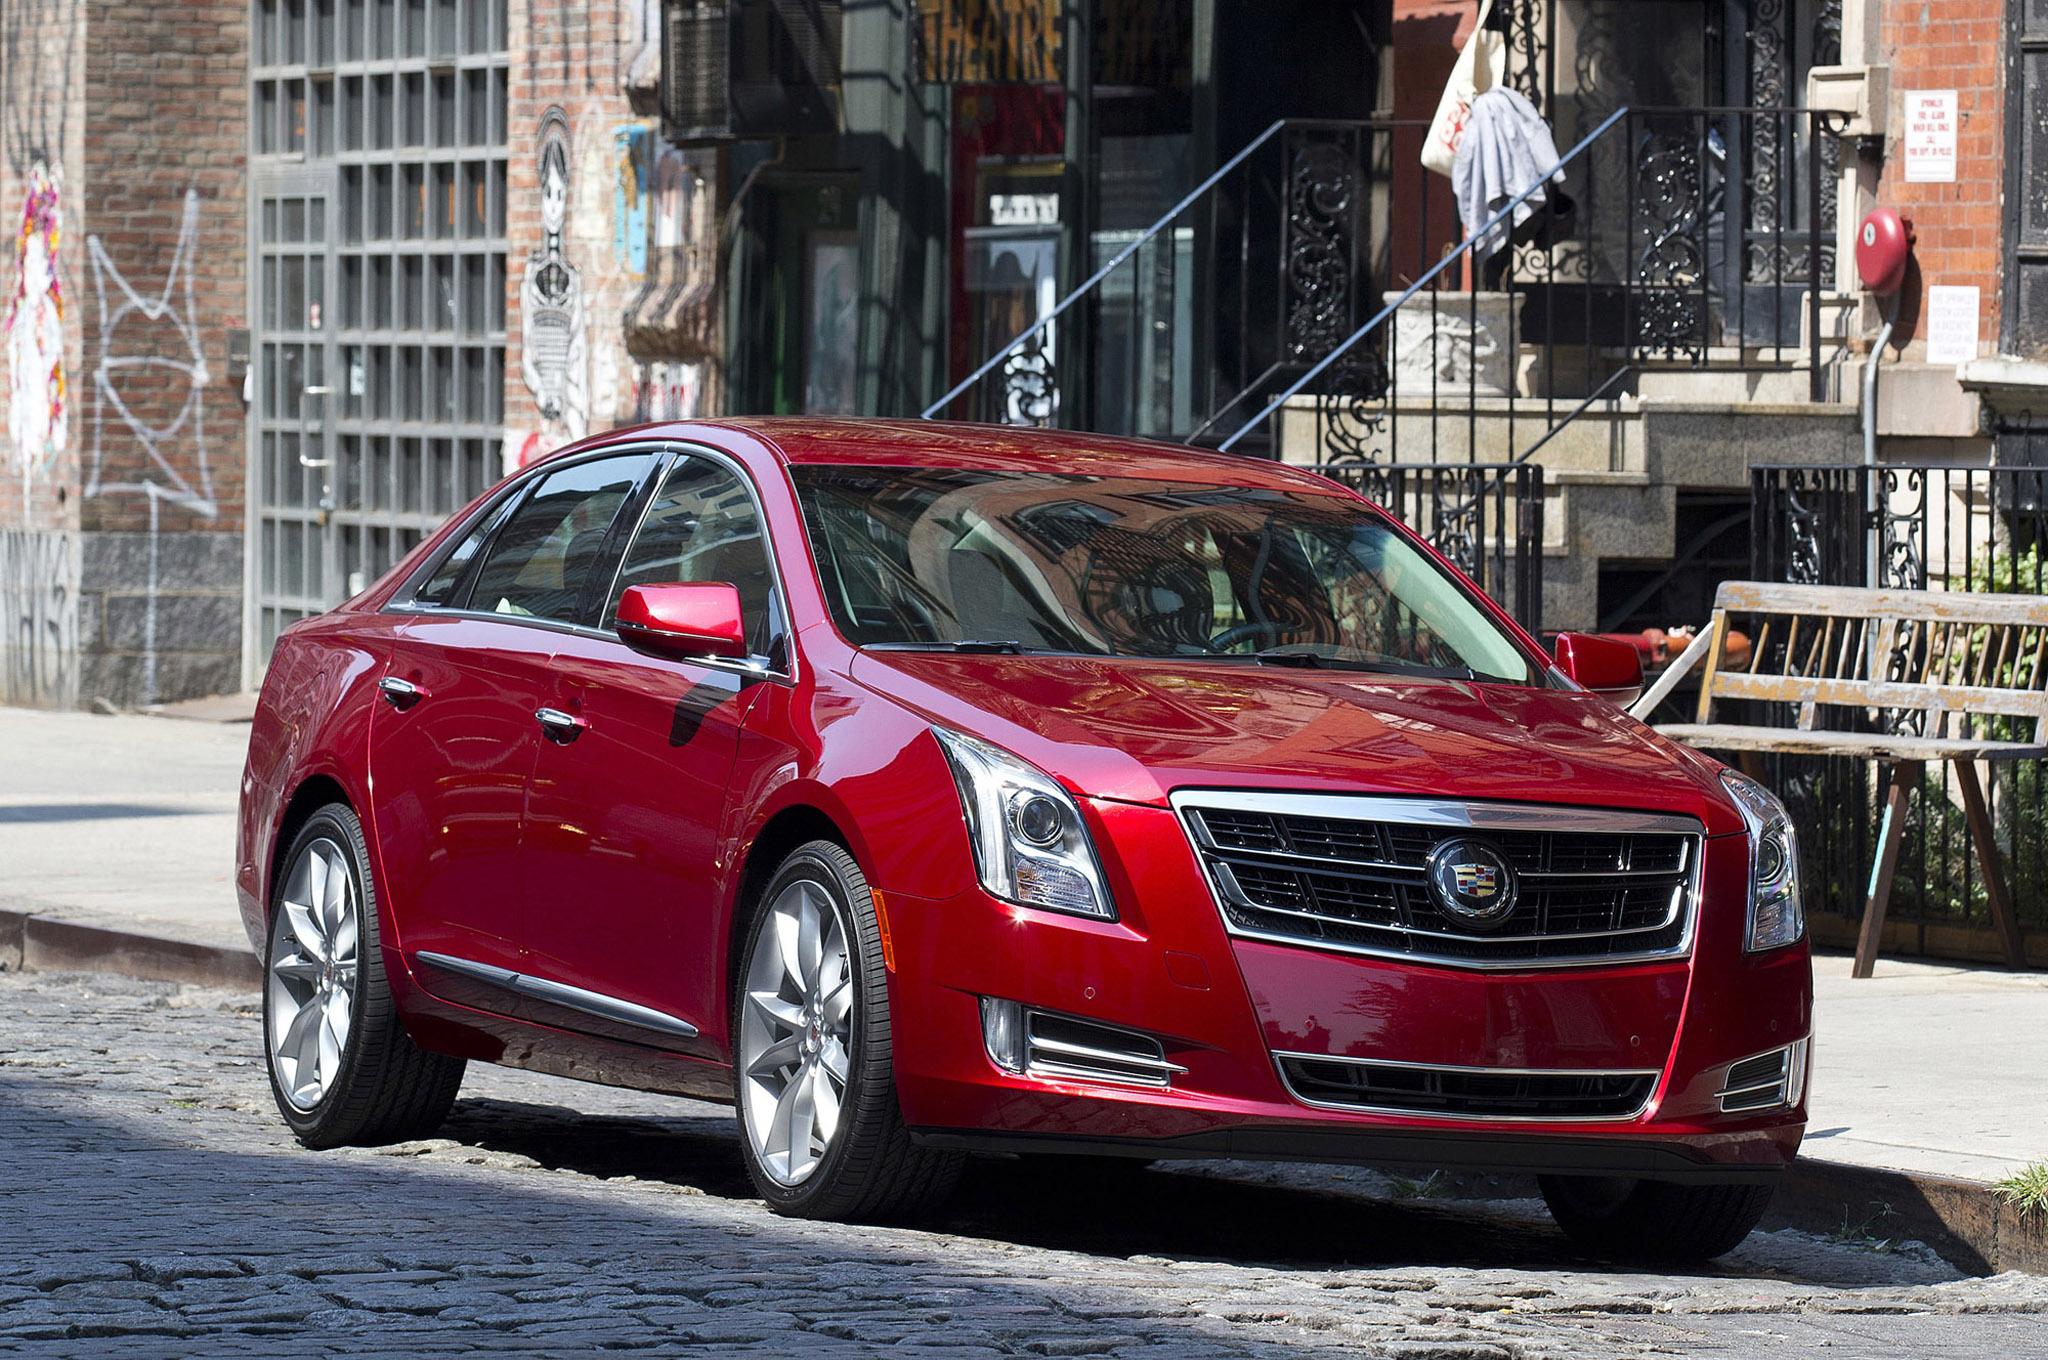 2014 Cadillac Cts Front Three Quarters 21